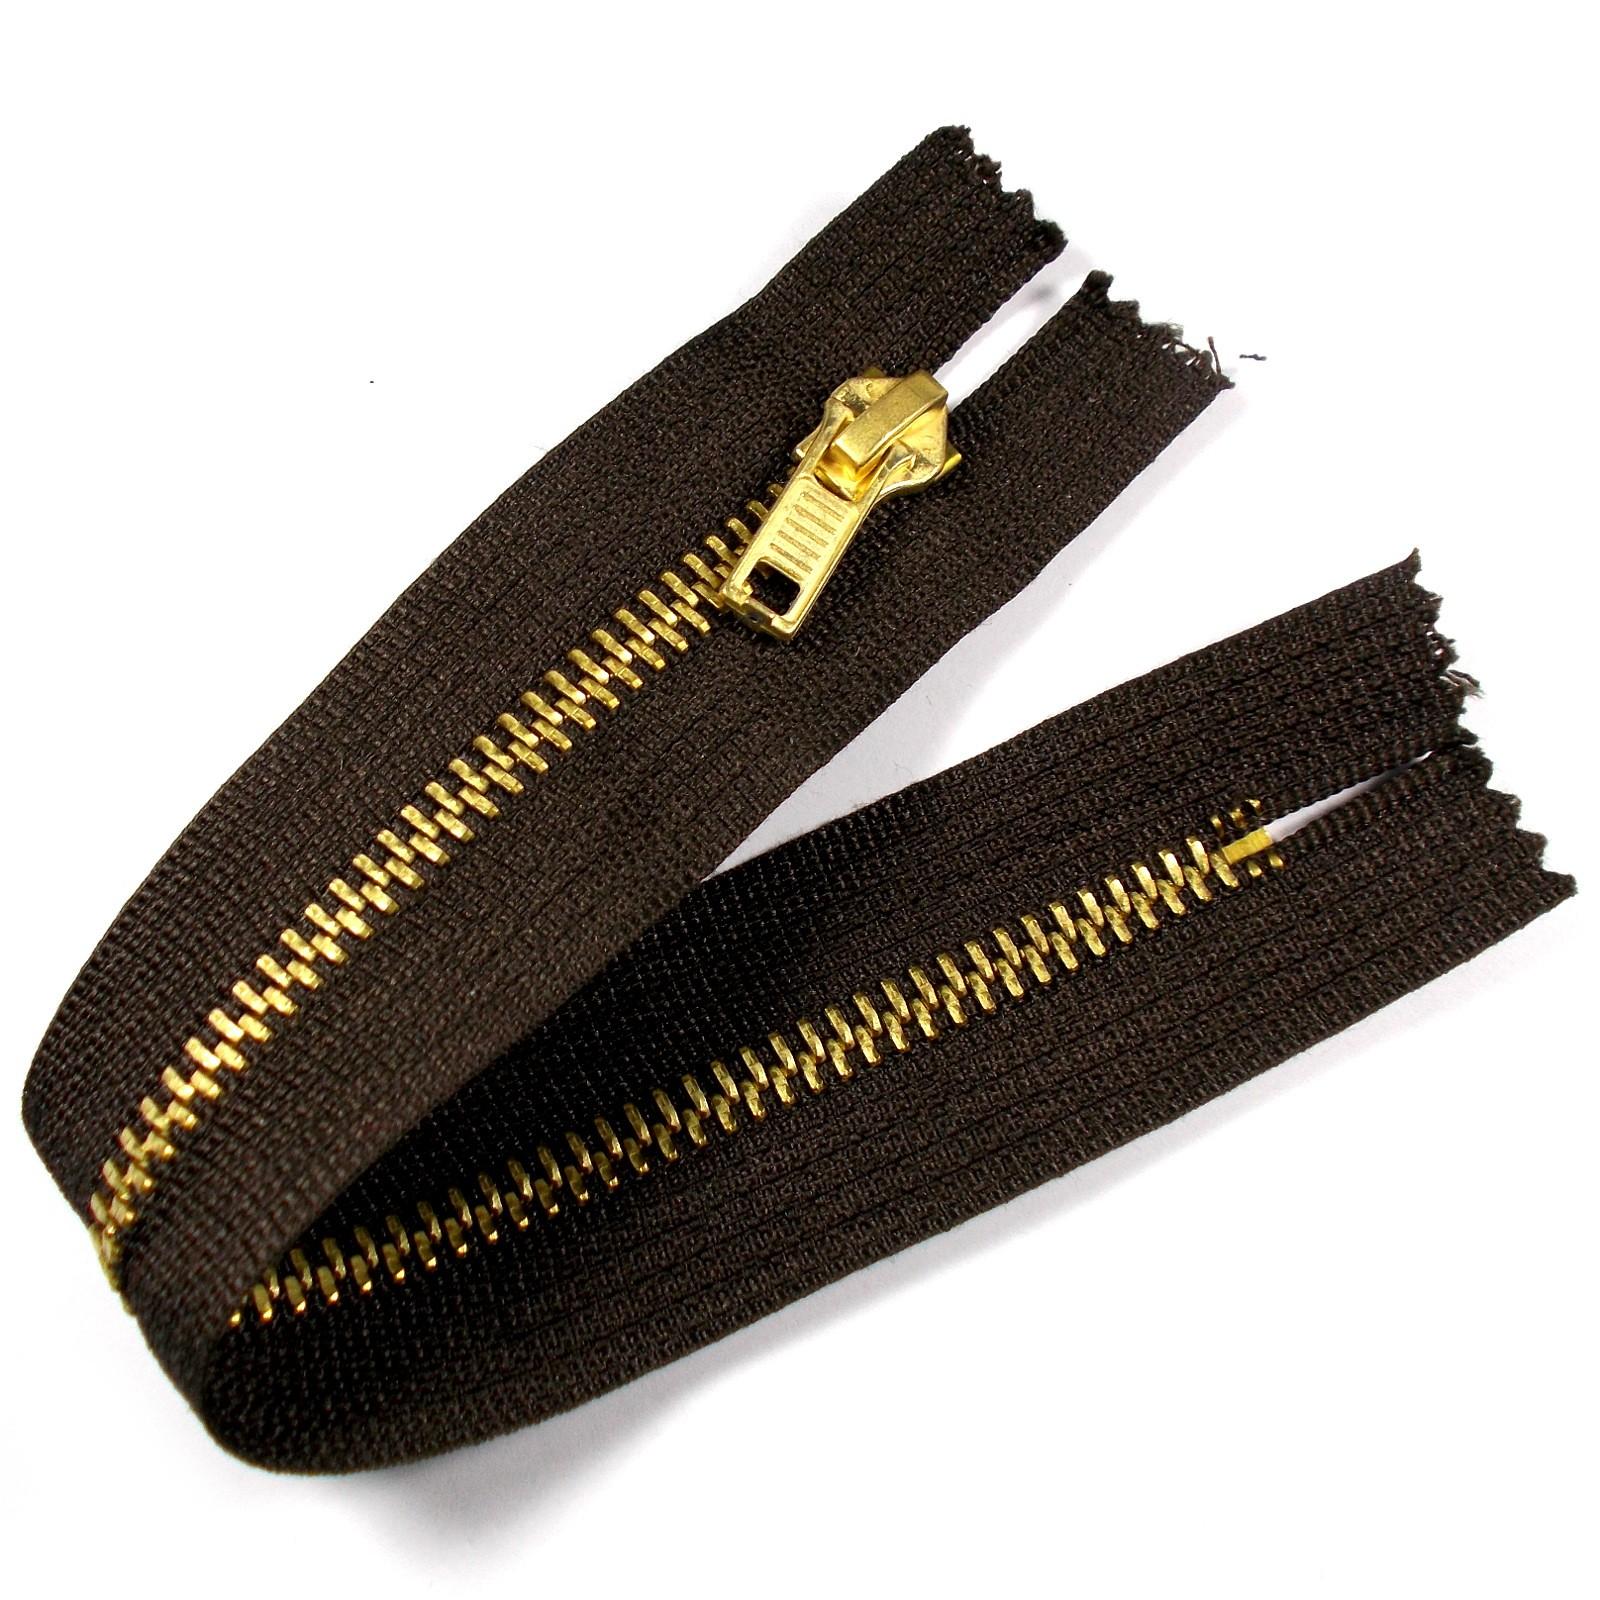 Gold Metal Trouser Jeans Zip Zipper 6 inch Brown